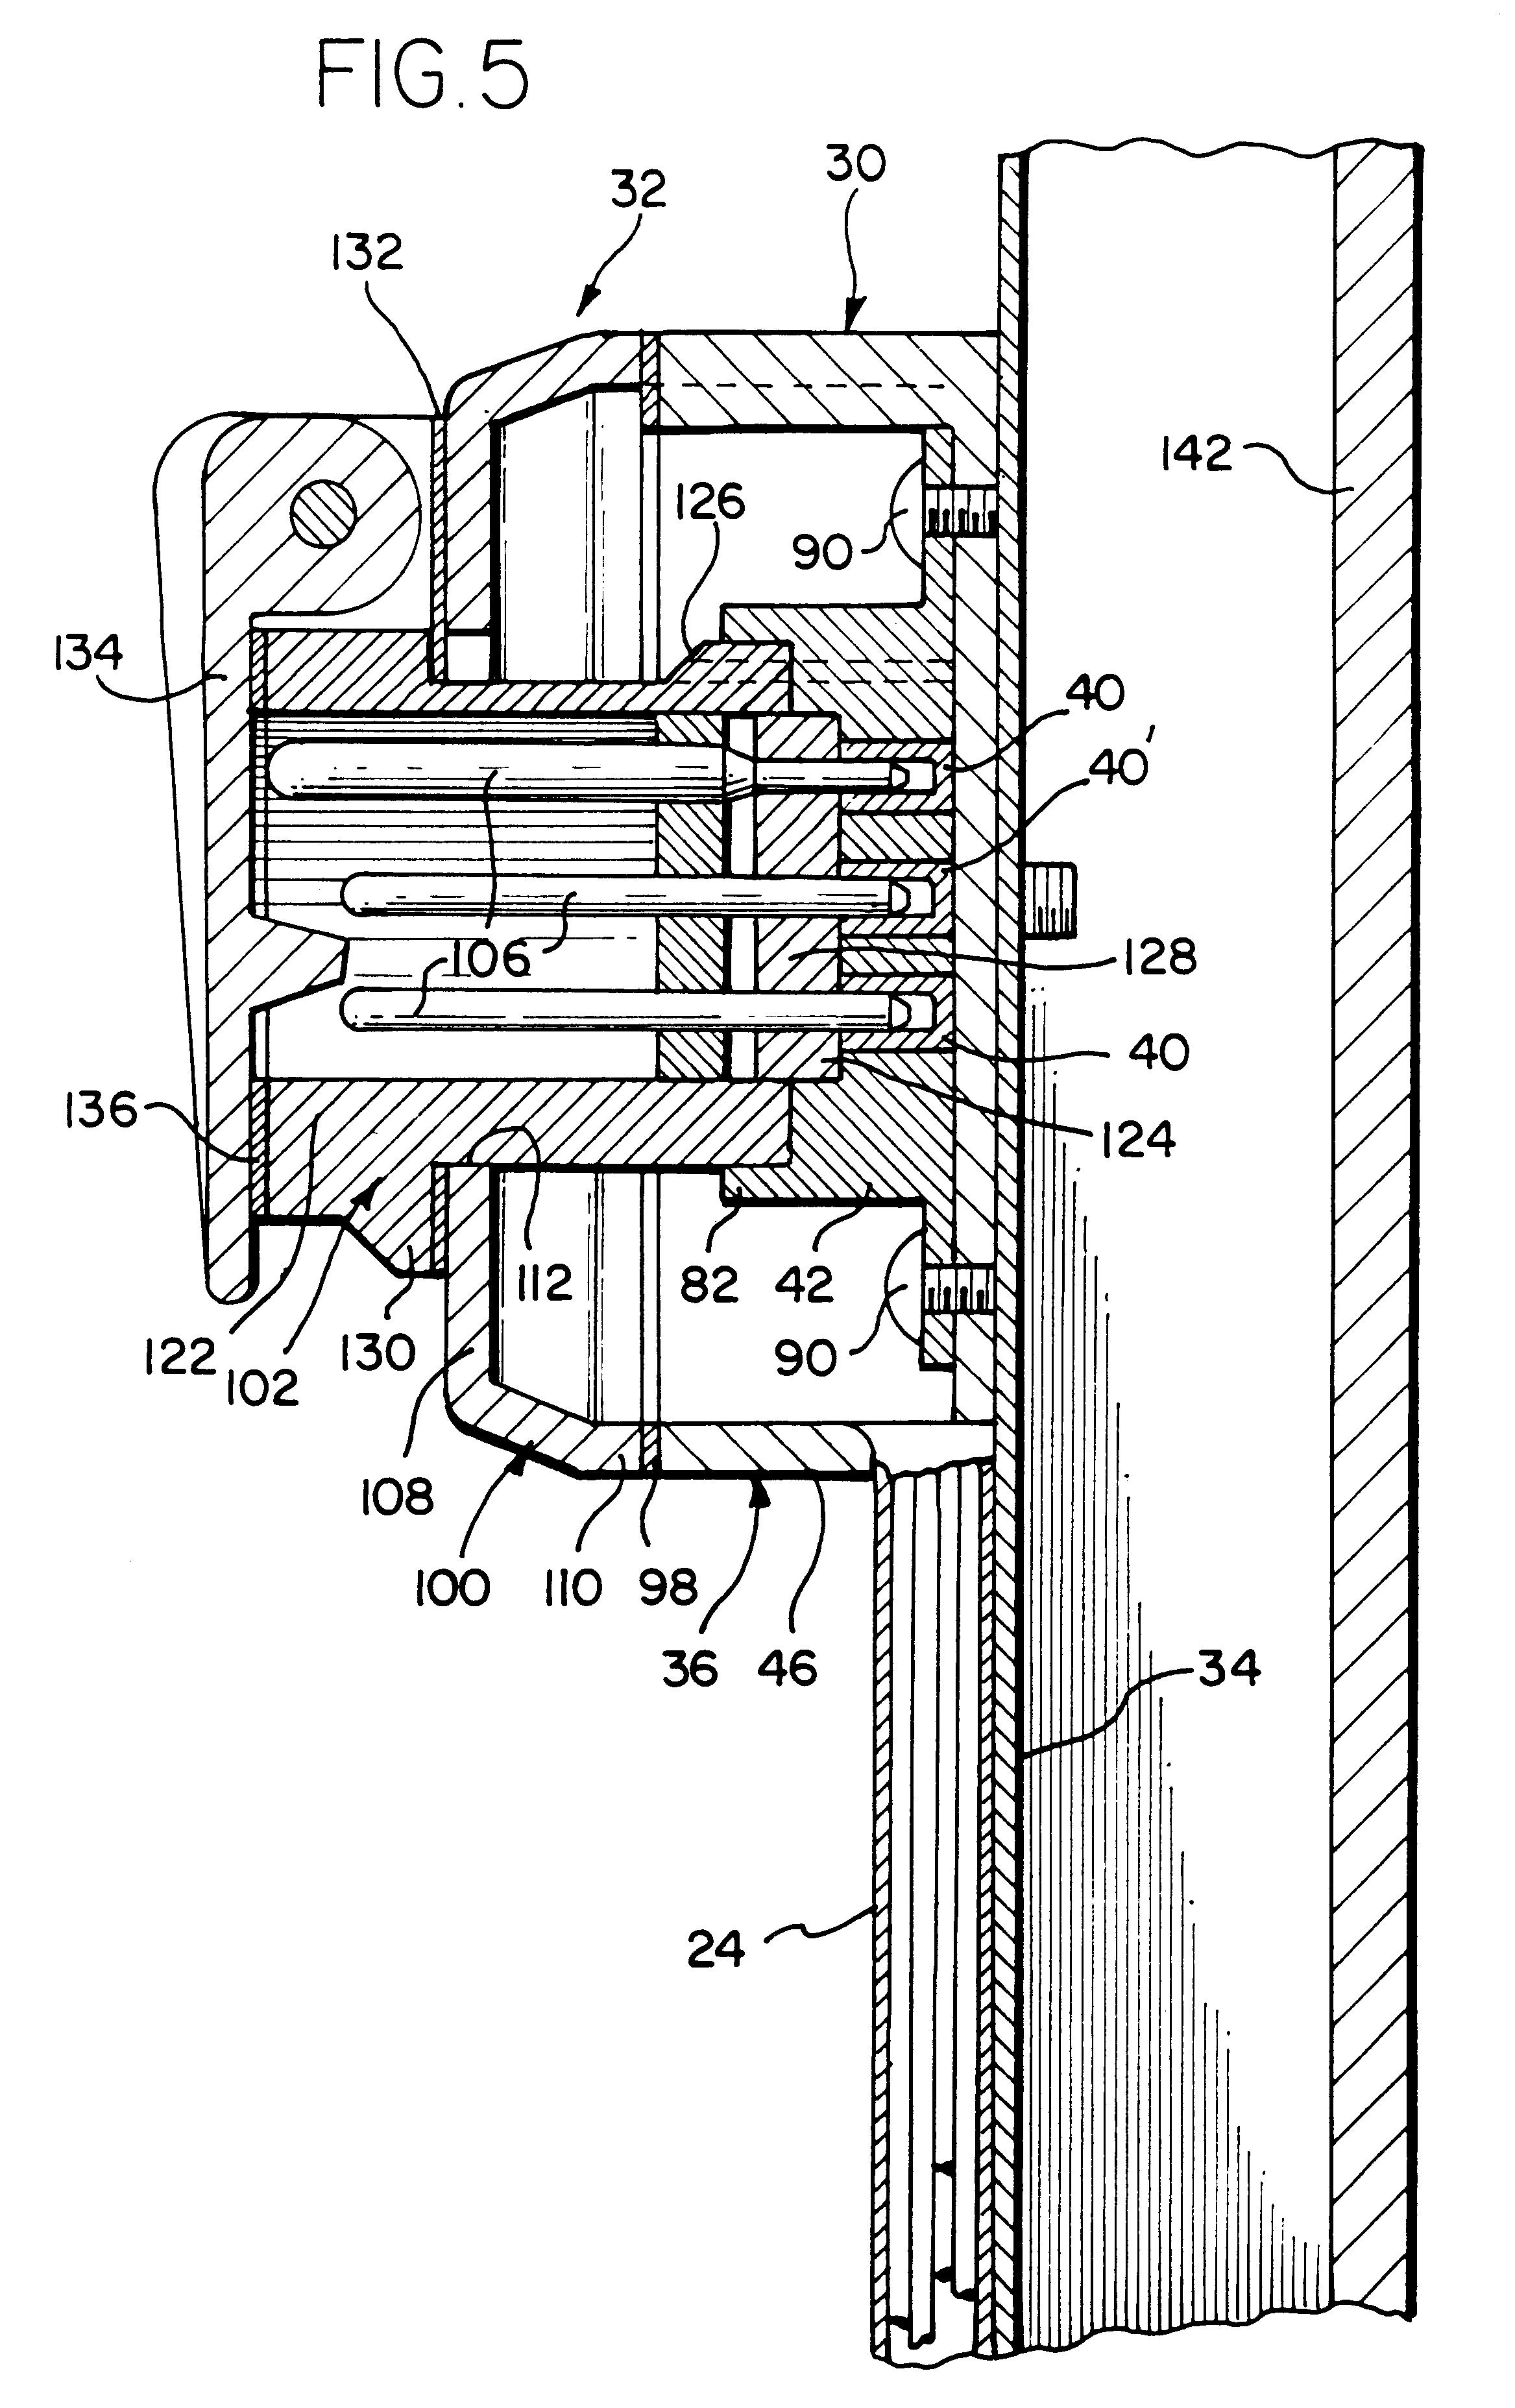 Haldex J560 Wiring Diagram 26 Wiring Diagram Images